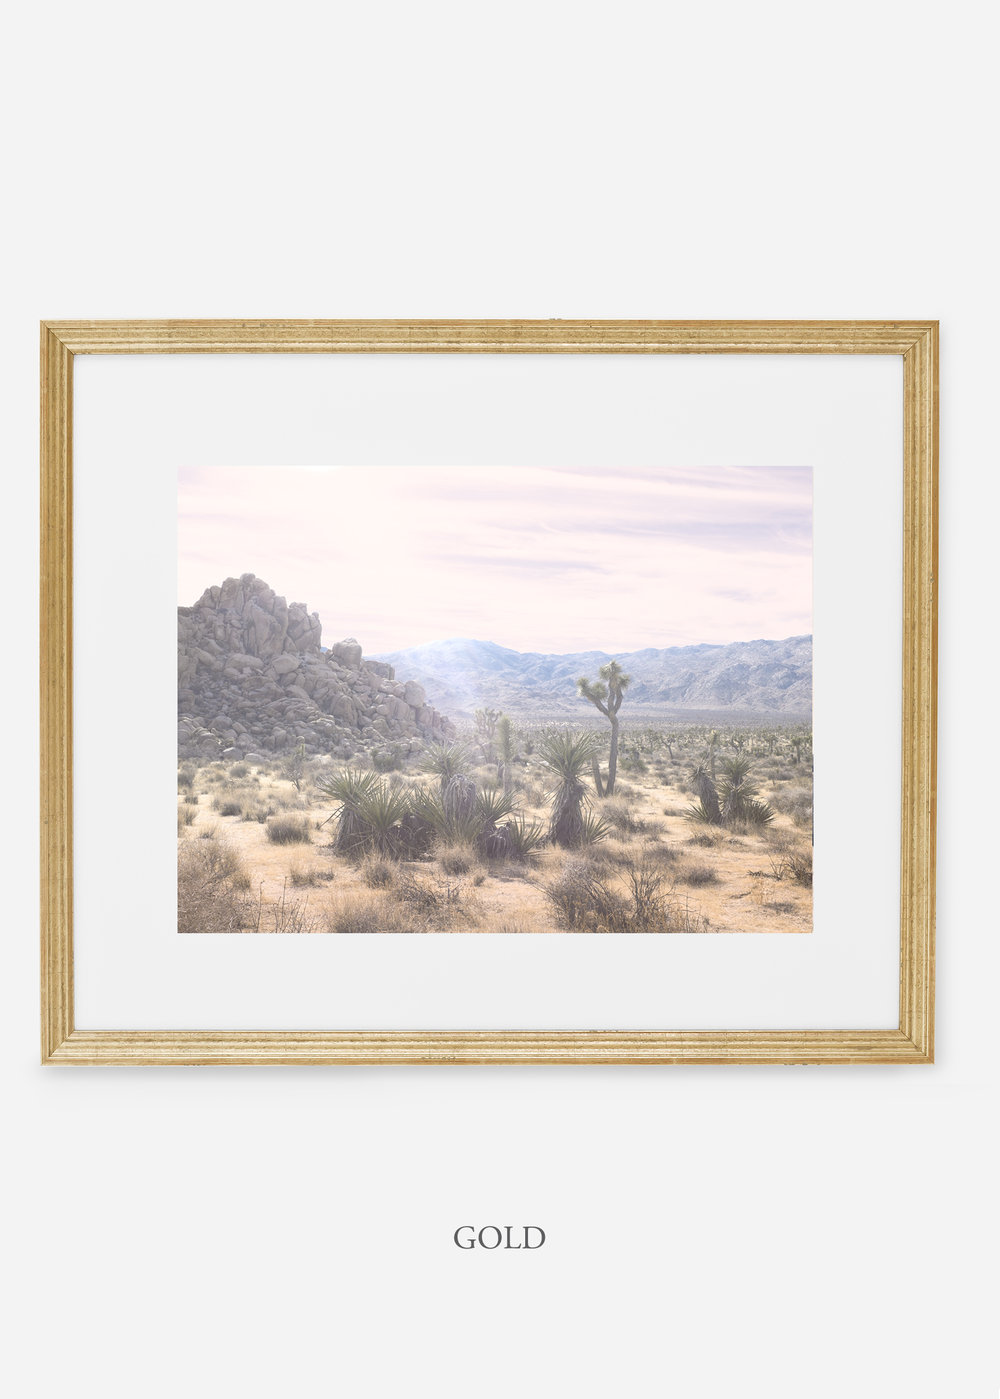 WilderCalifornia_goldframe_JoshuaTree_No.9_interiordesign_prints_art.jpg